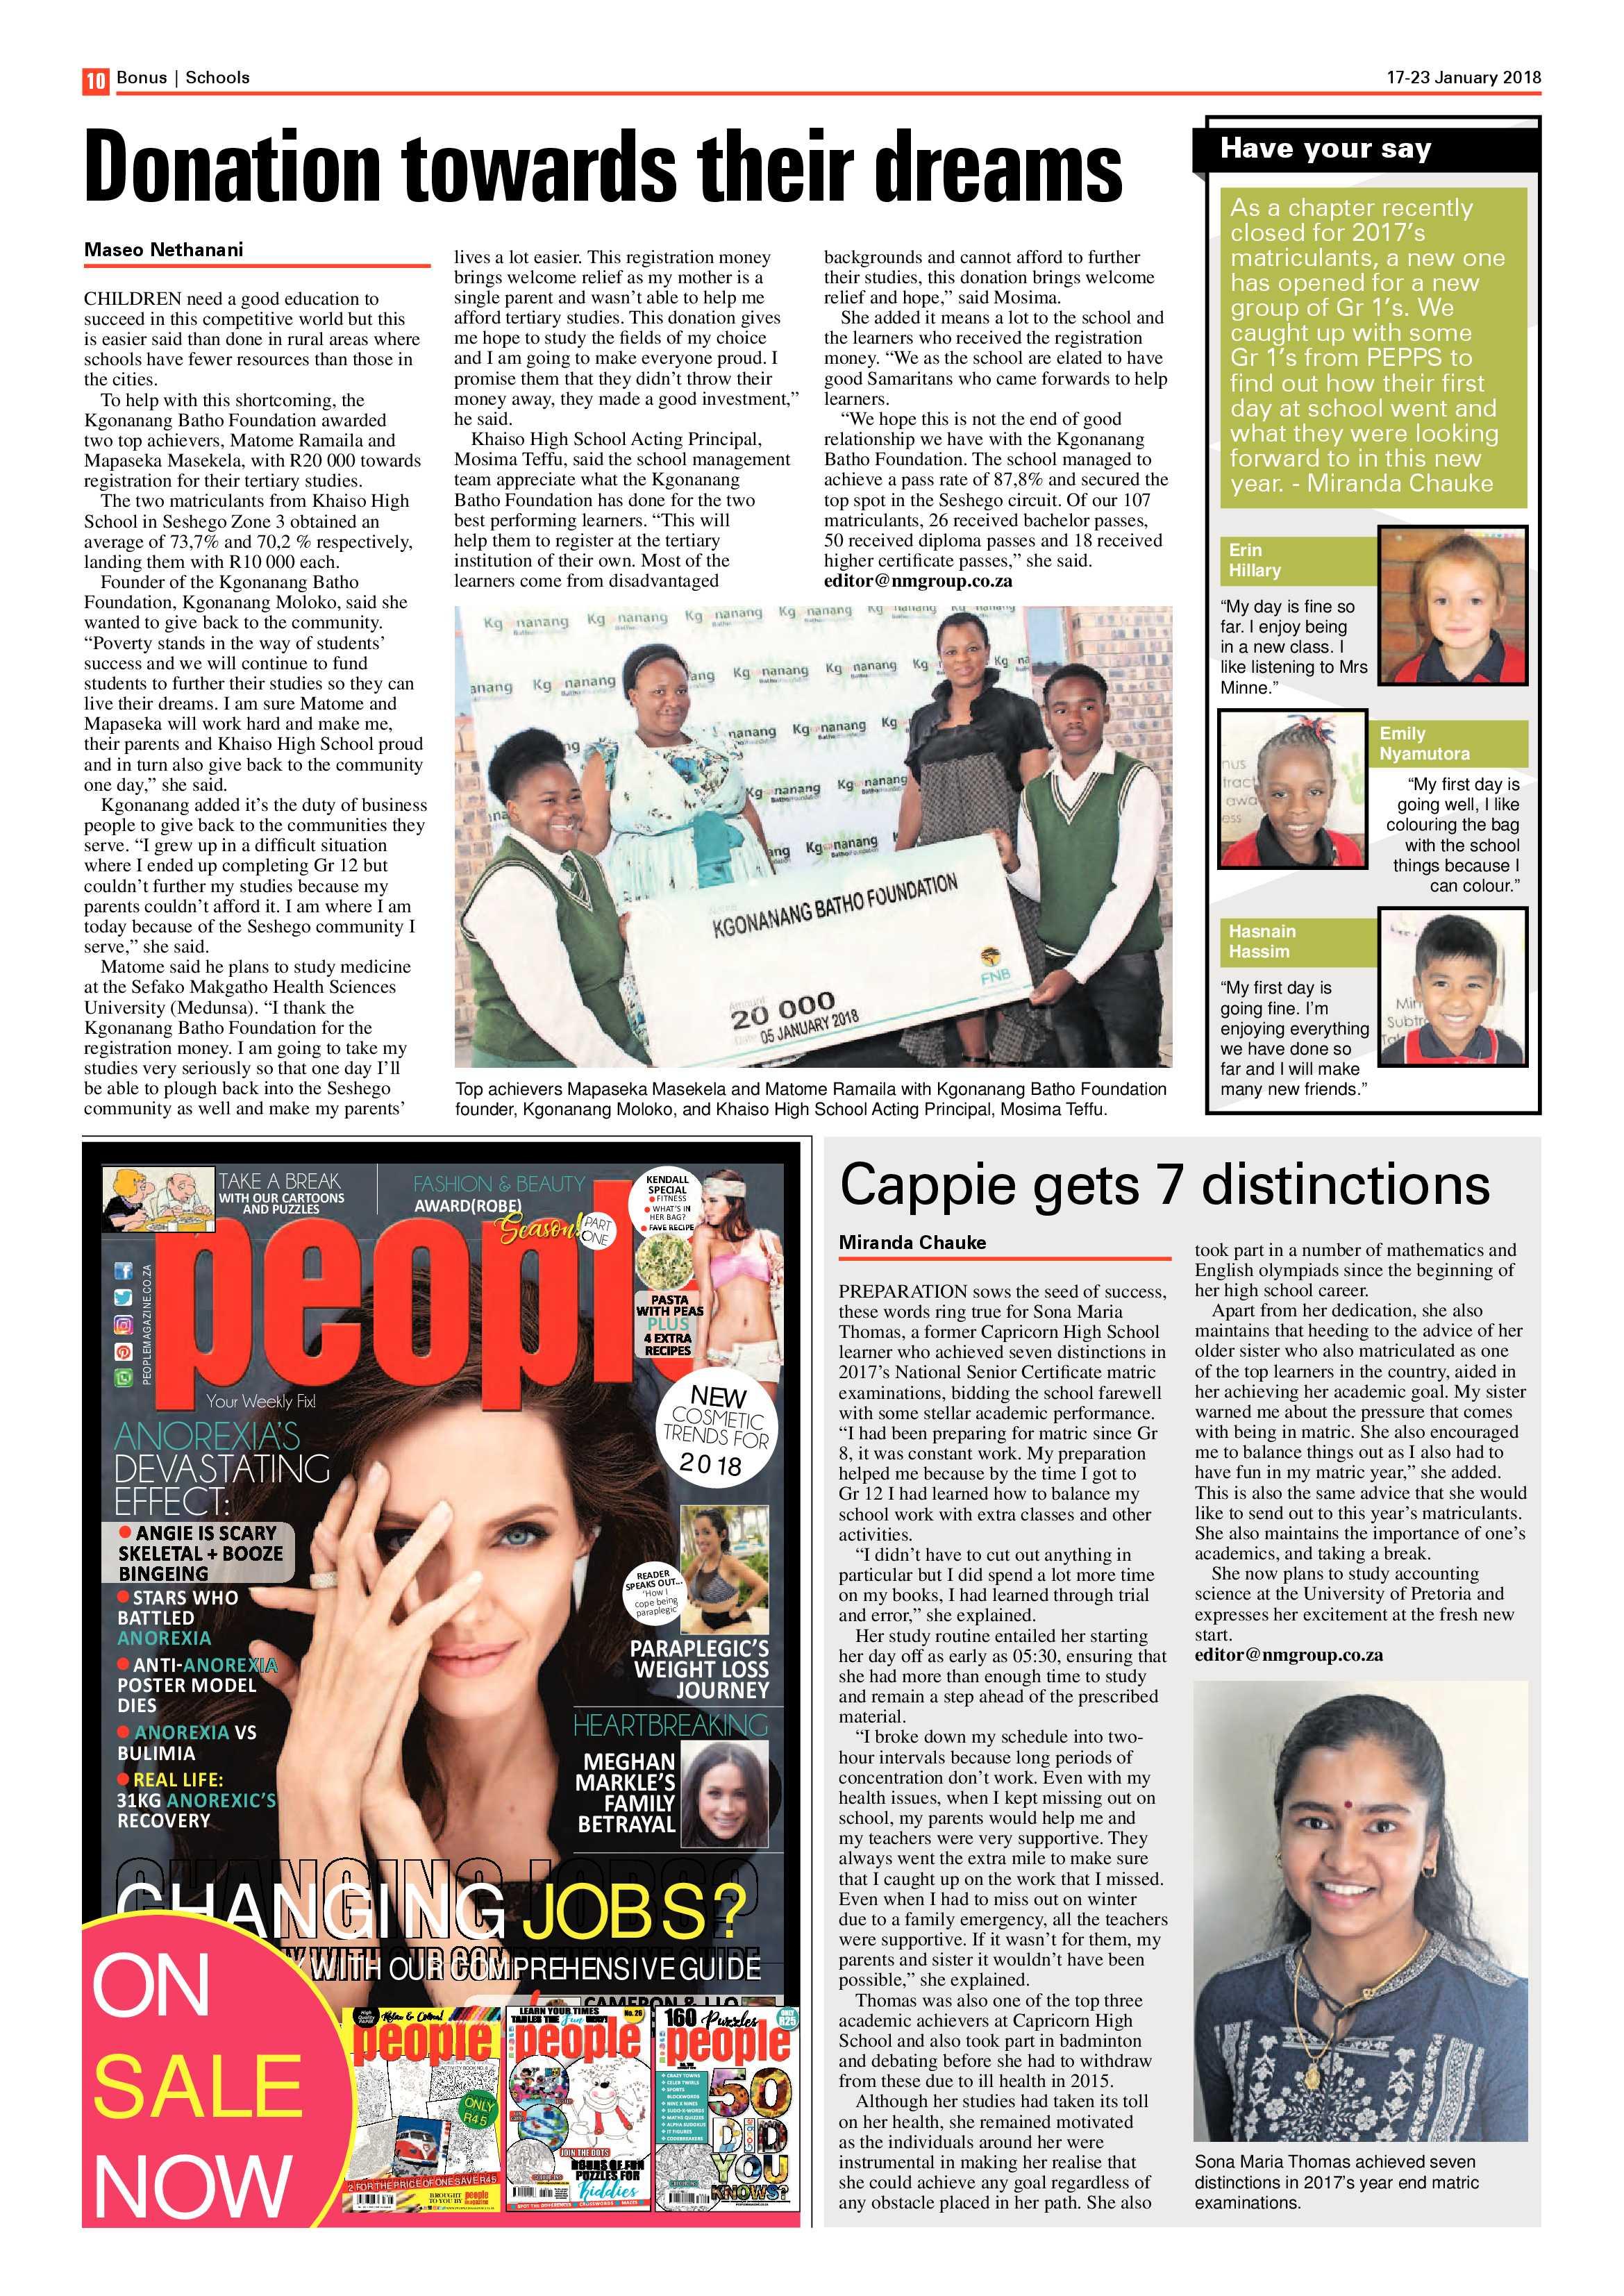 review-bonus-17-january-2018-epapers-page-10